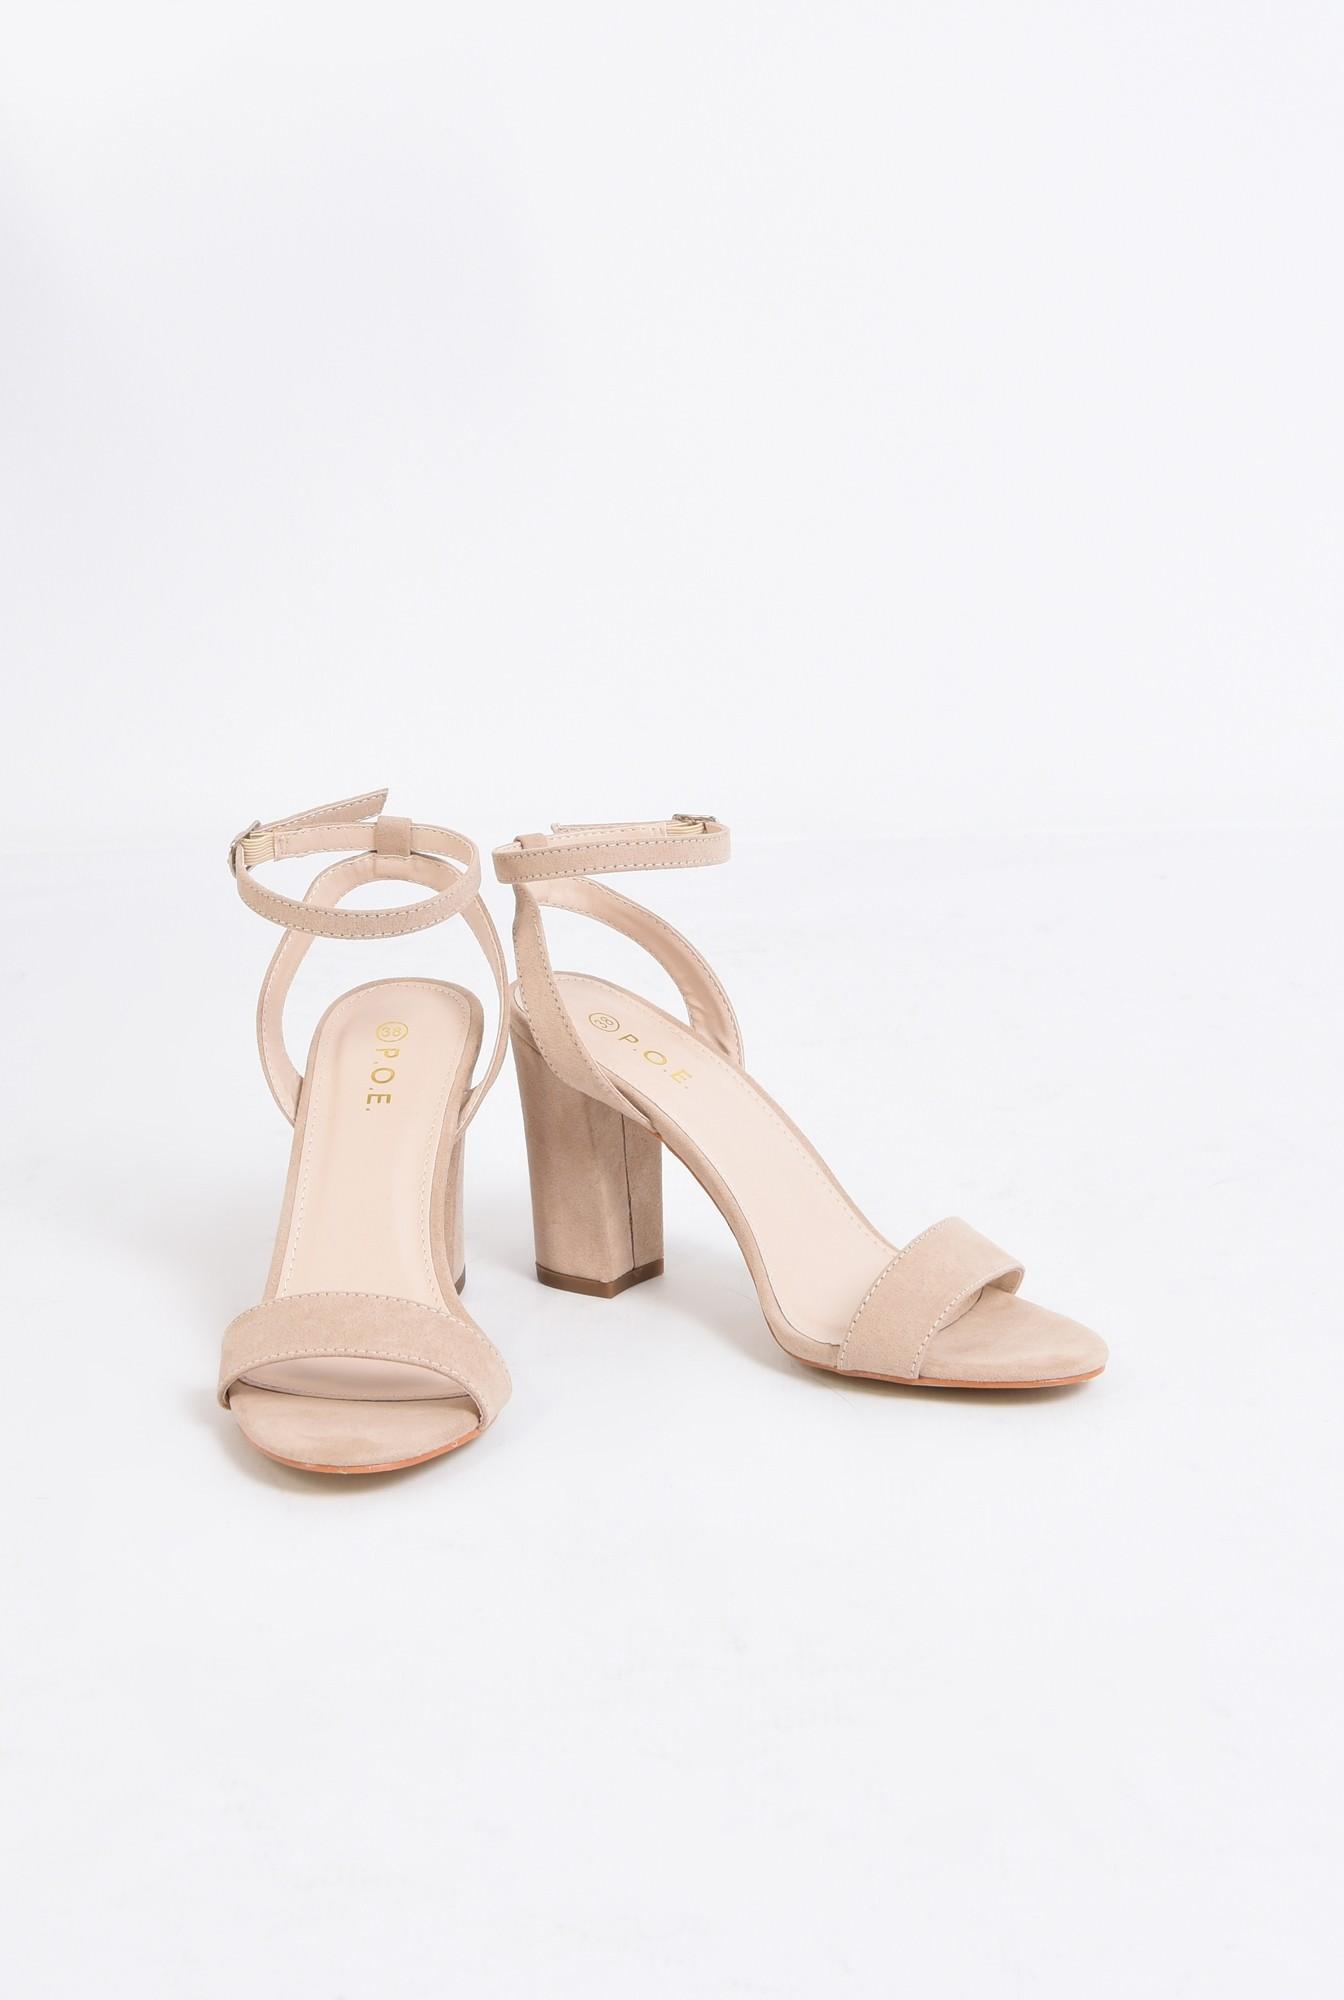 3 - sandale elegante, crem, toc gros, piele intoarsa eco